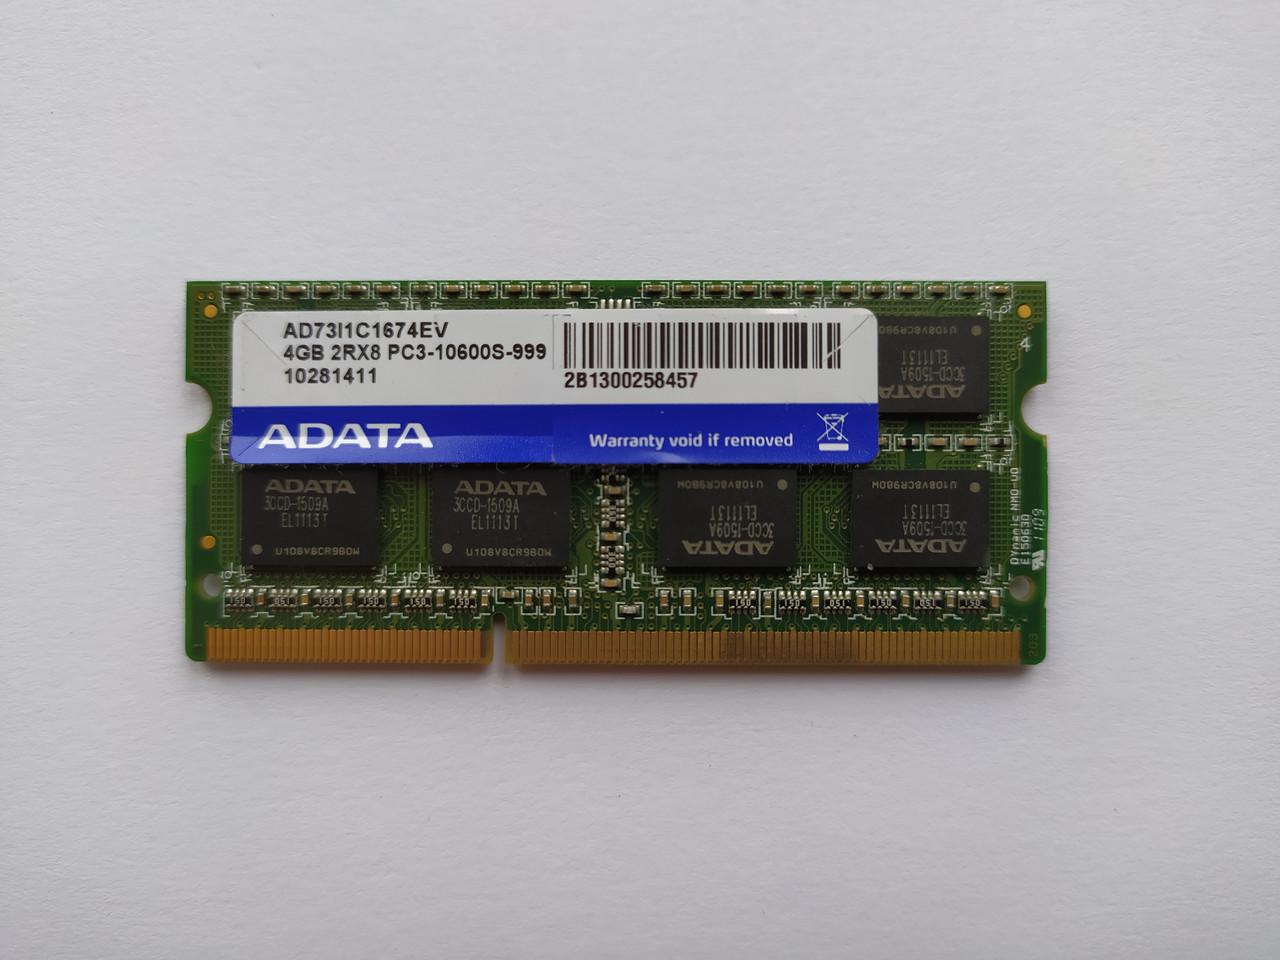 Оперативная память для ноутбука SODIMM ADATA DDR3 4Gb 1333MHz PC3-10600S (AD73I1C1674EV) Б/У